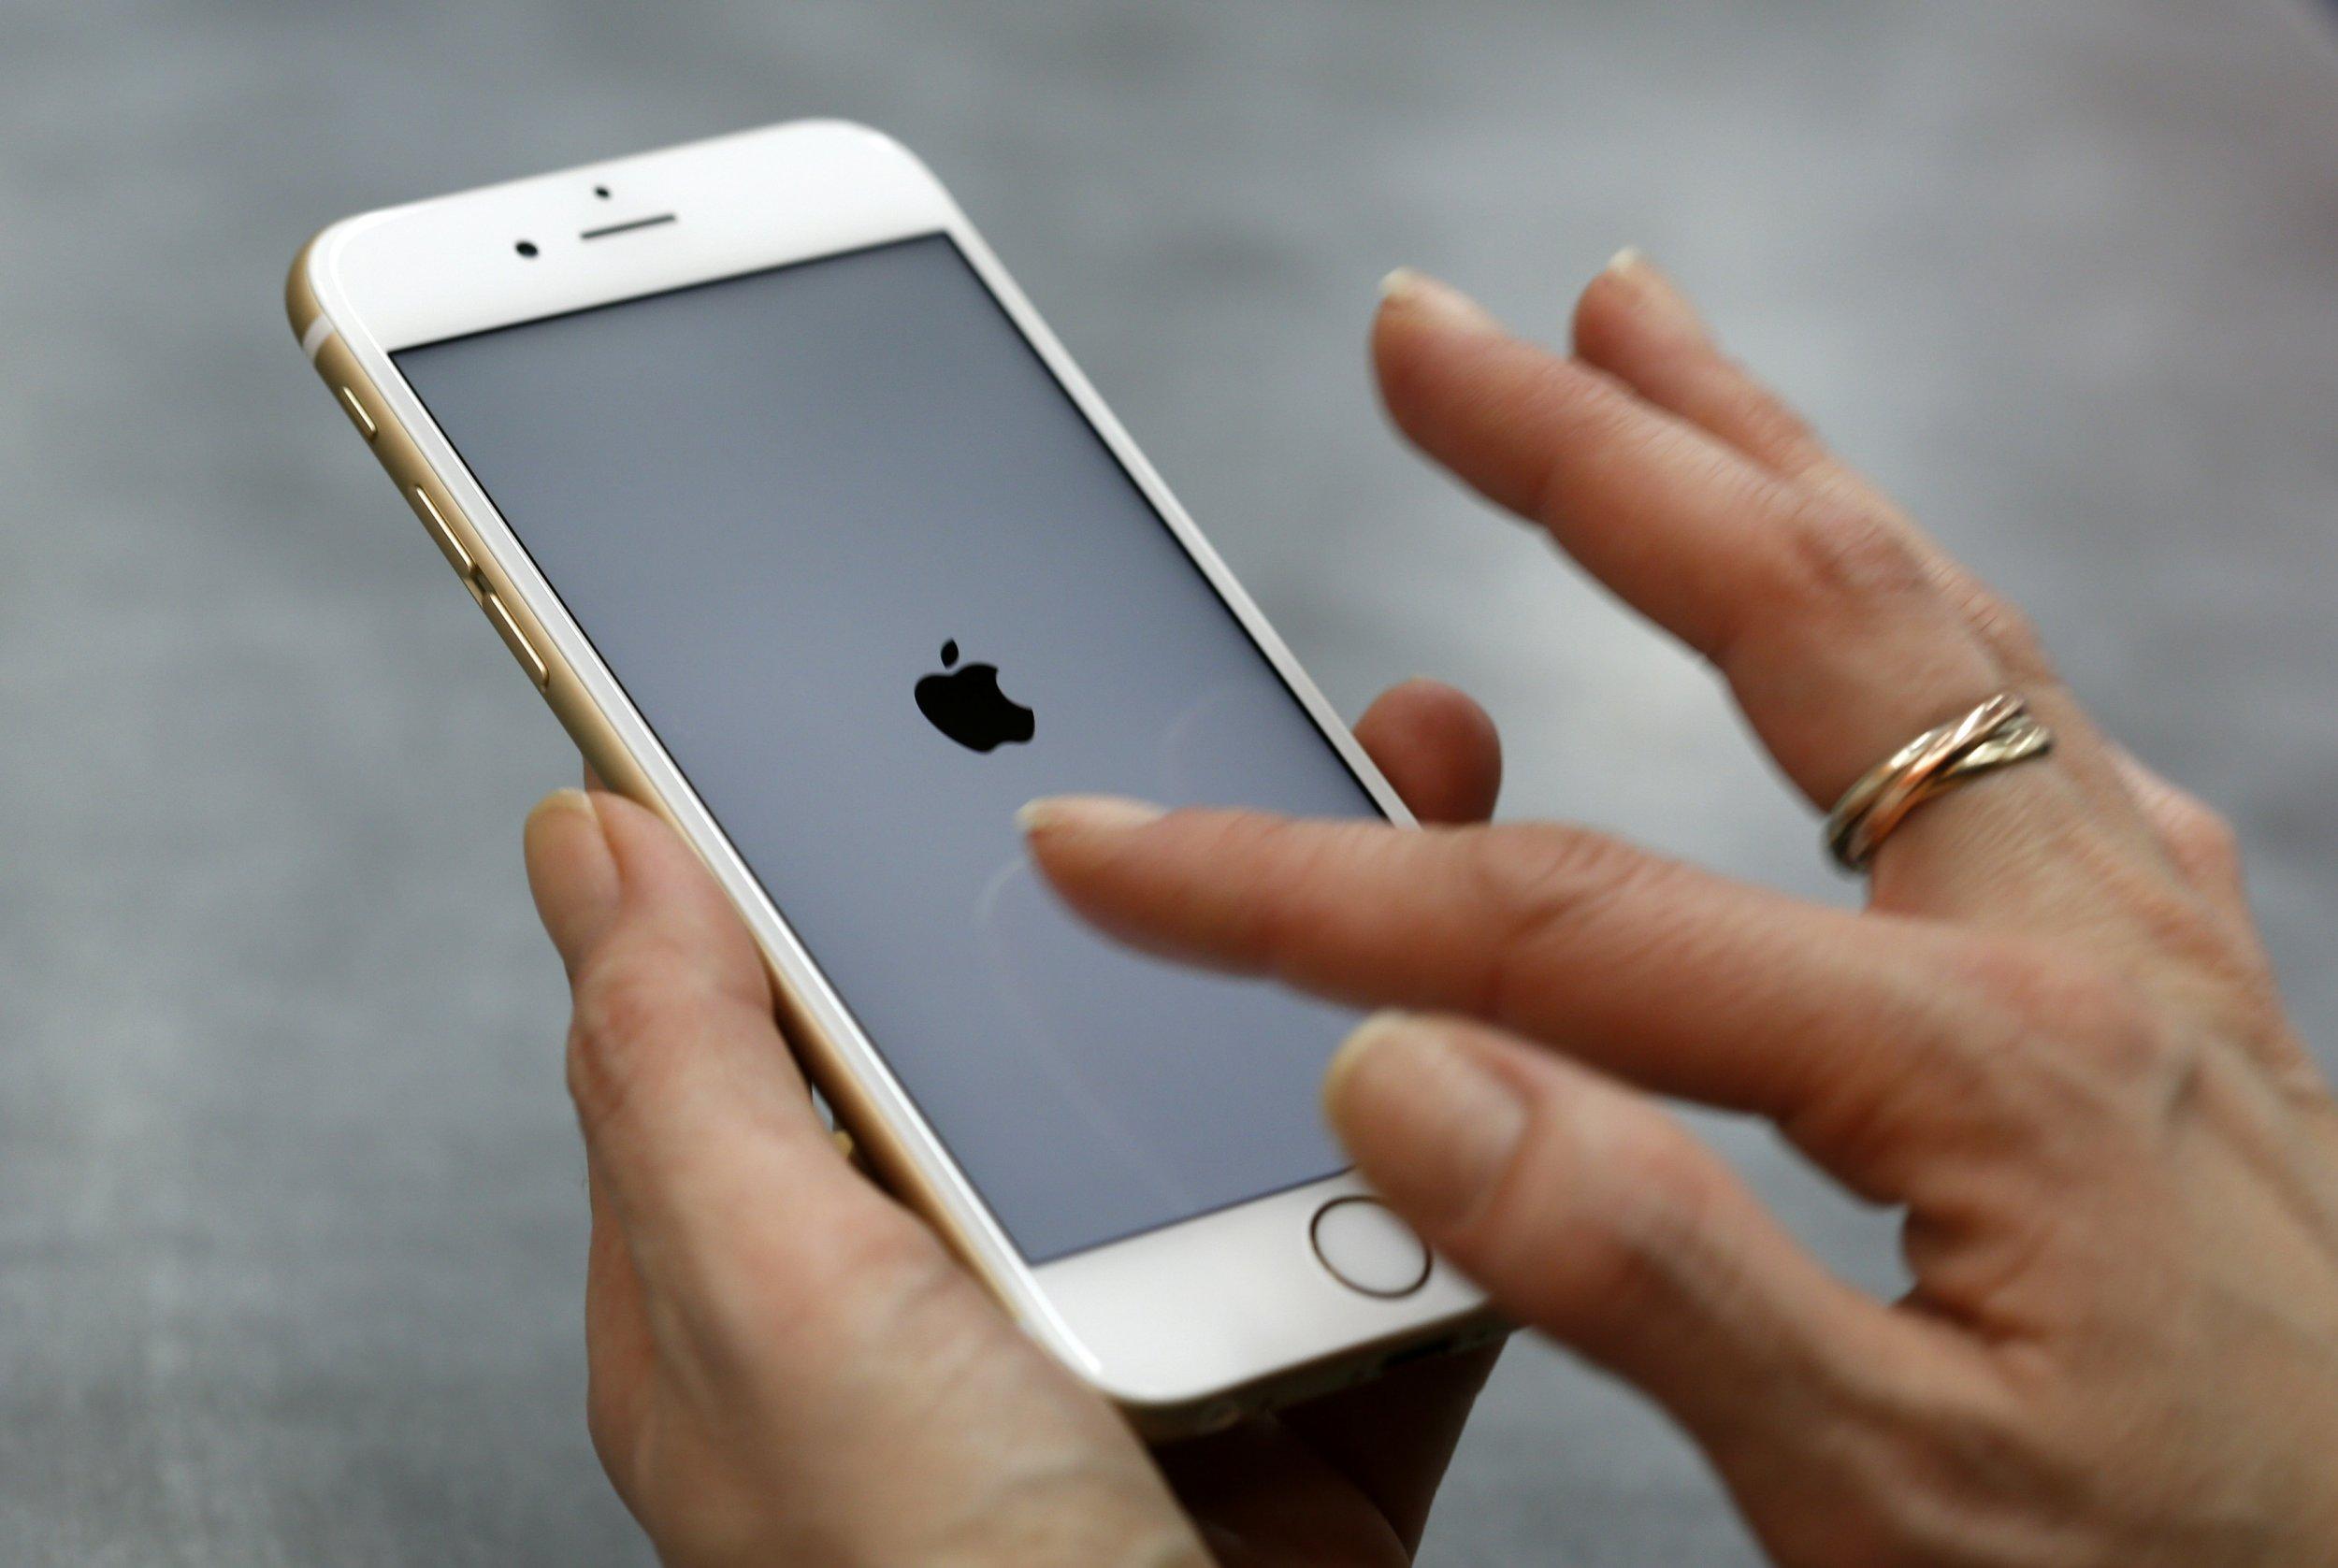 apple tim cook san bernardino iphone unlock court fbi unlock